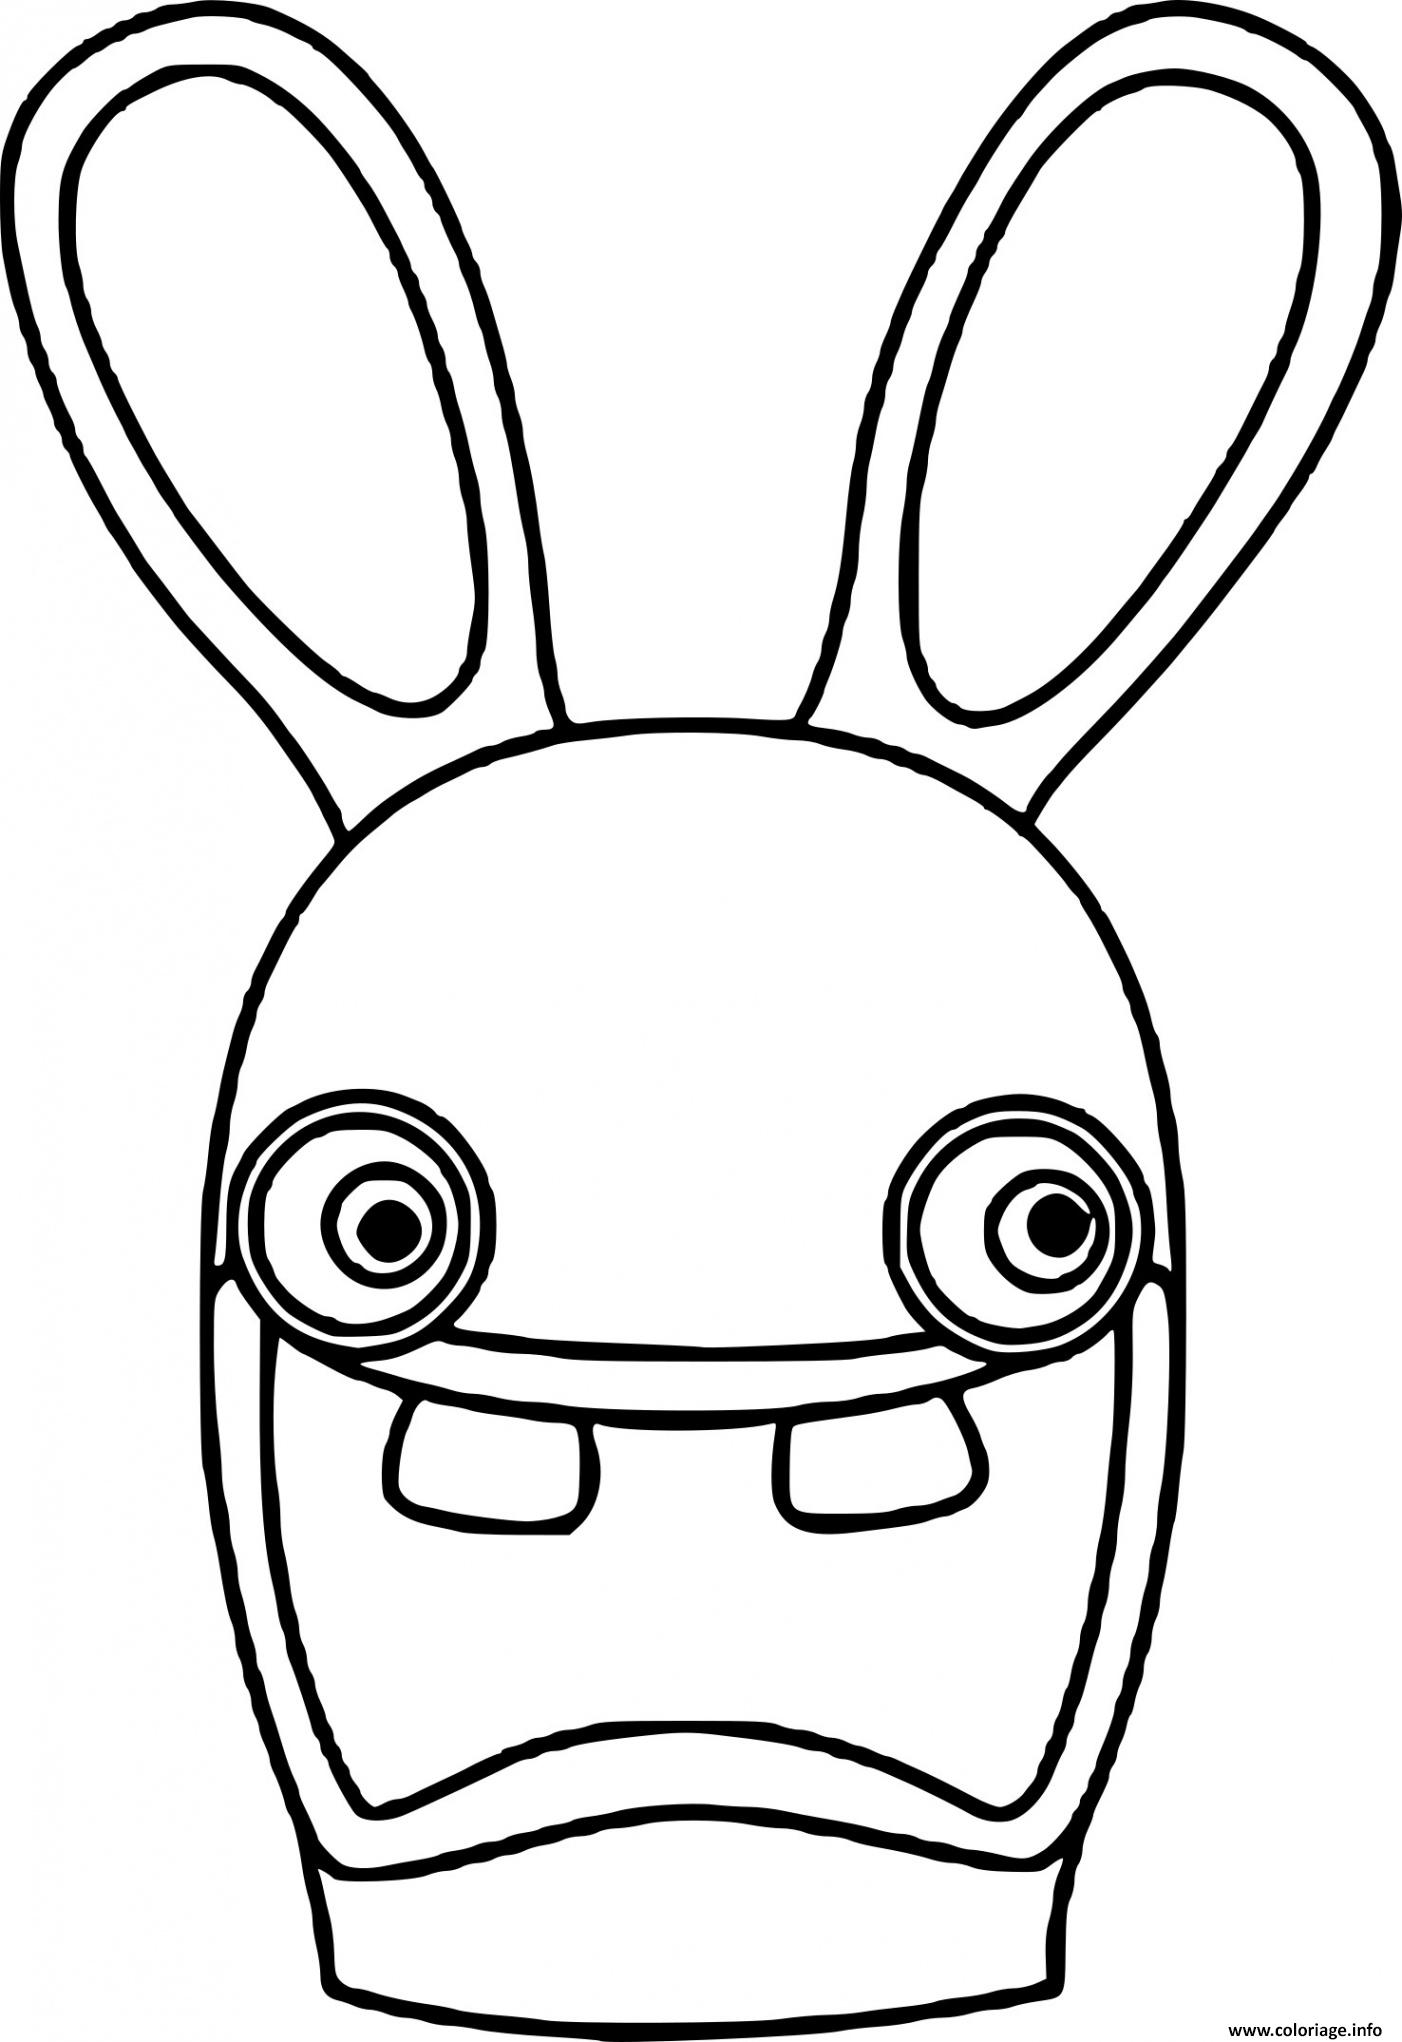 Coloriage tete lapin cretin - JeColorie.com